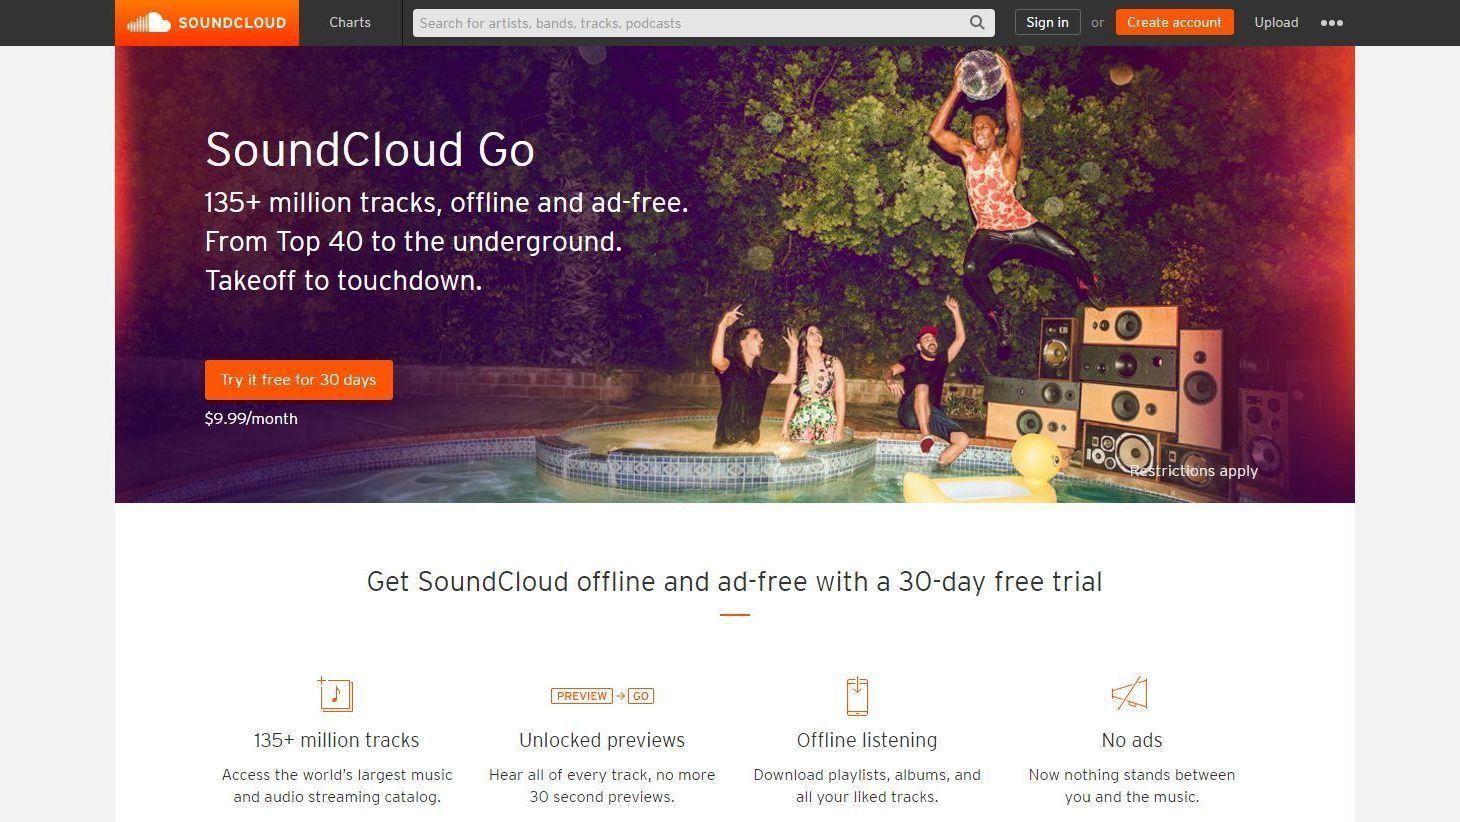 SoundCloud byr på 135 millioner låter og tilbyr en abonnementsbasert strømmetjeneste.